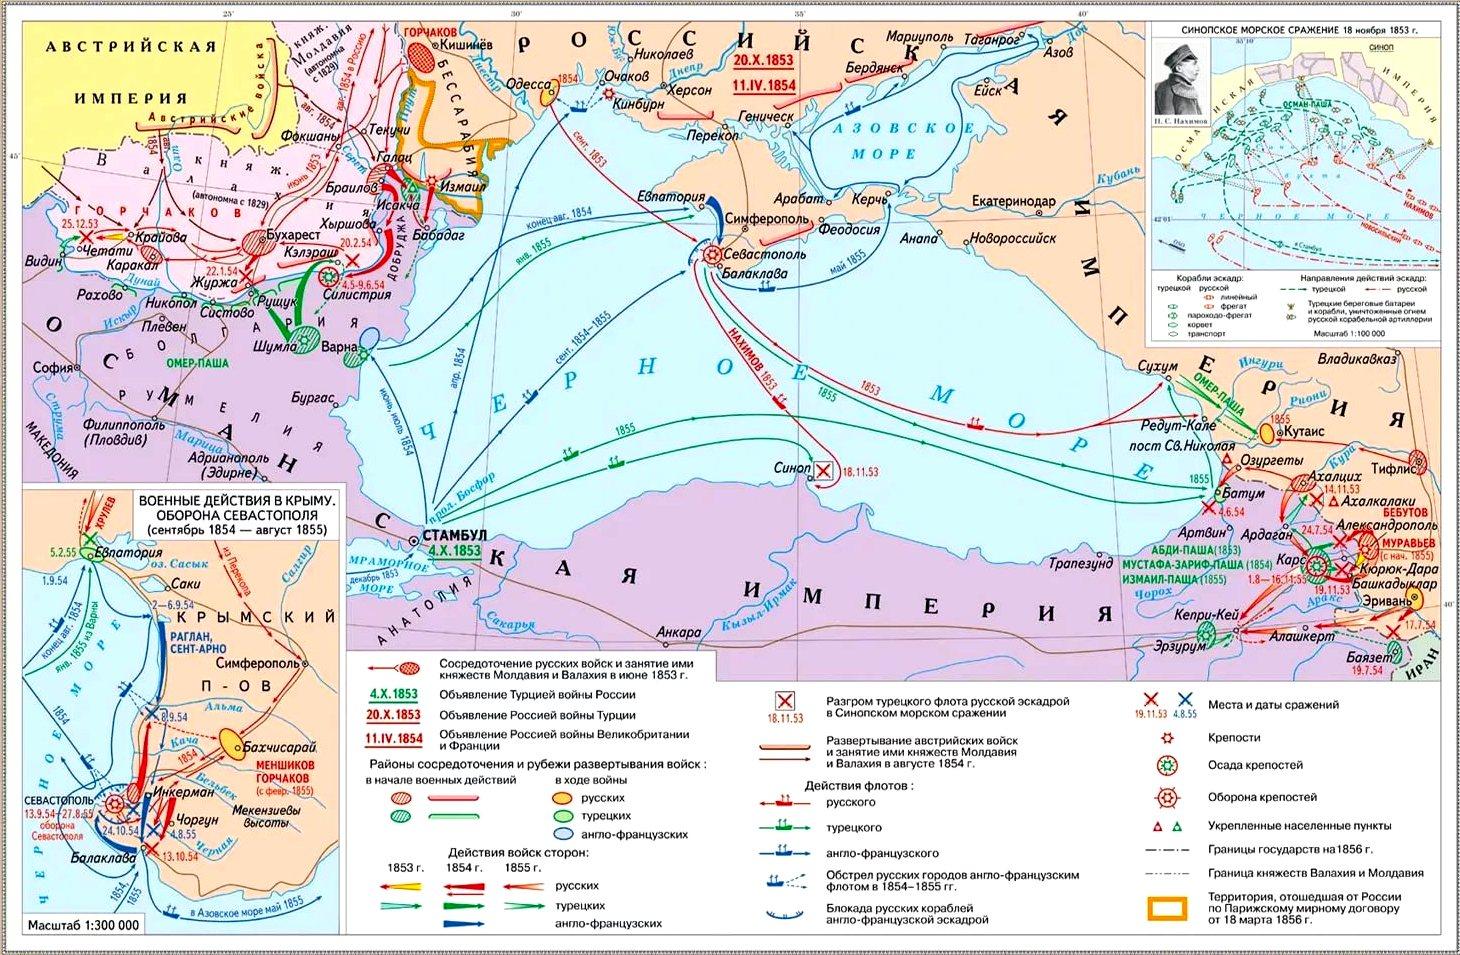 крымская война 1853-1856 карта